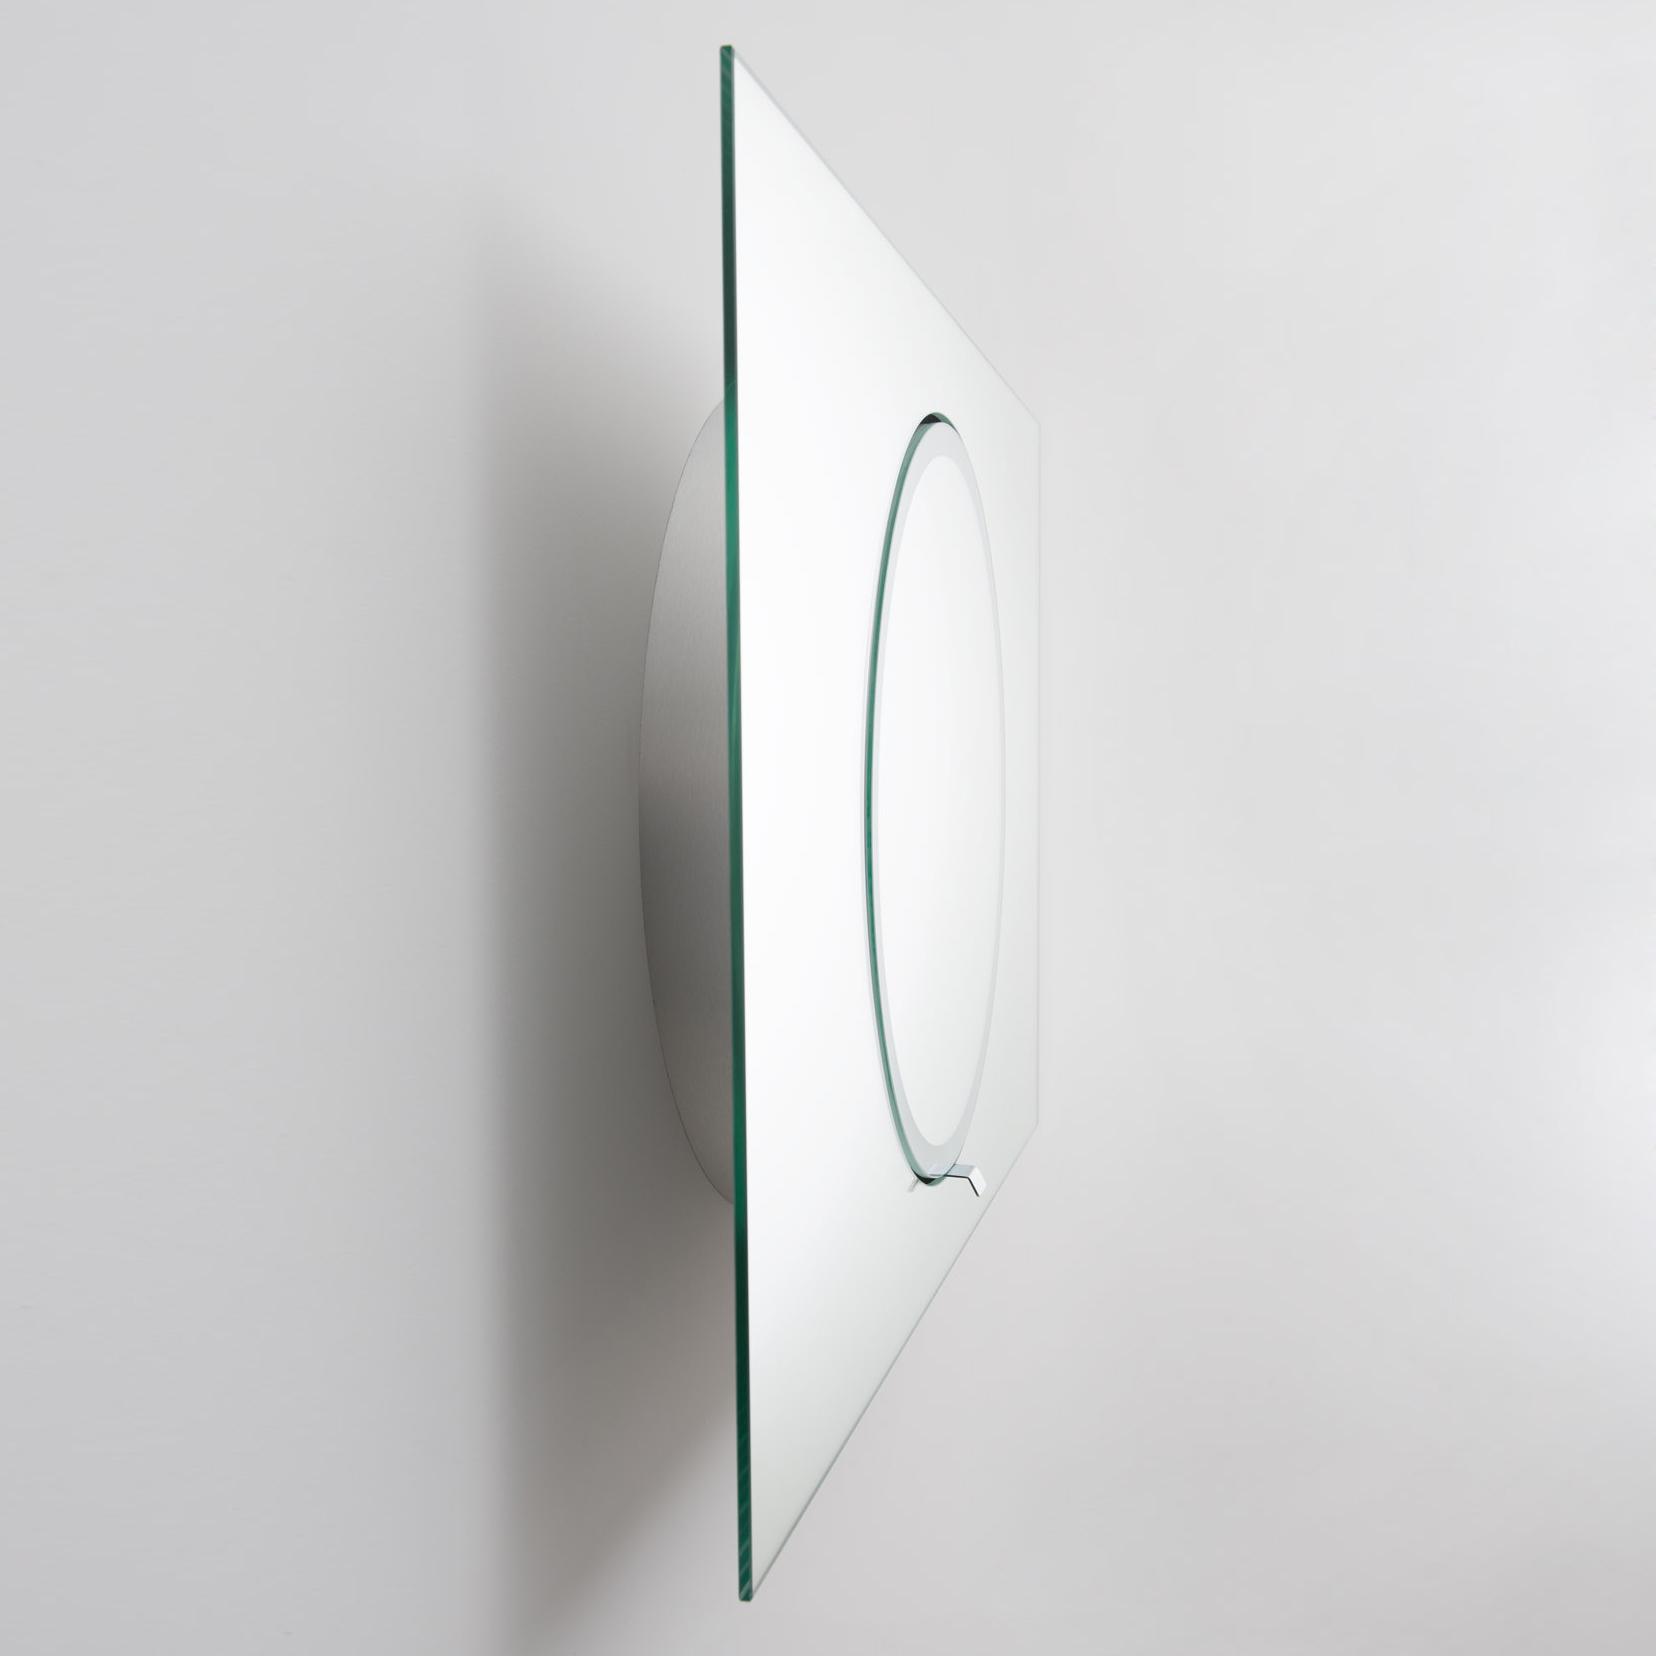 miior_dot_mirror_Designalive2